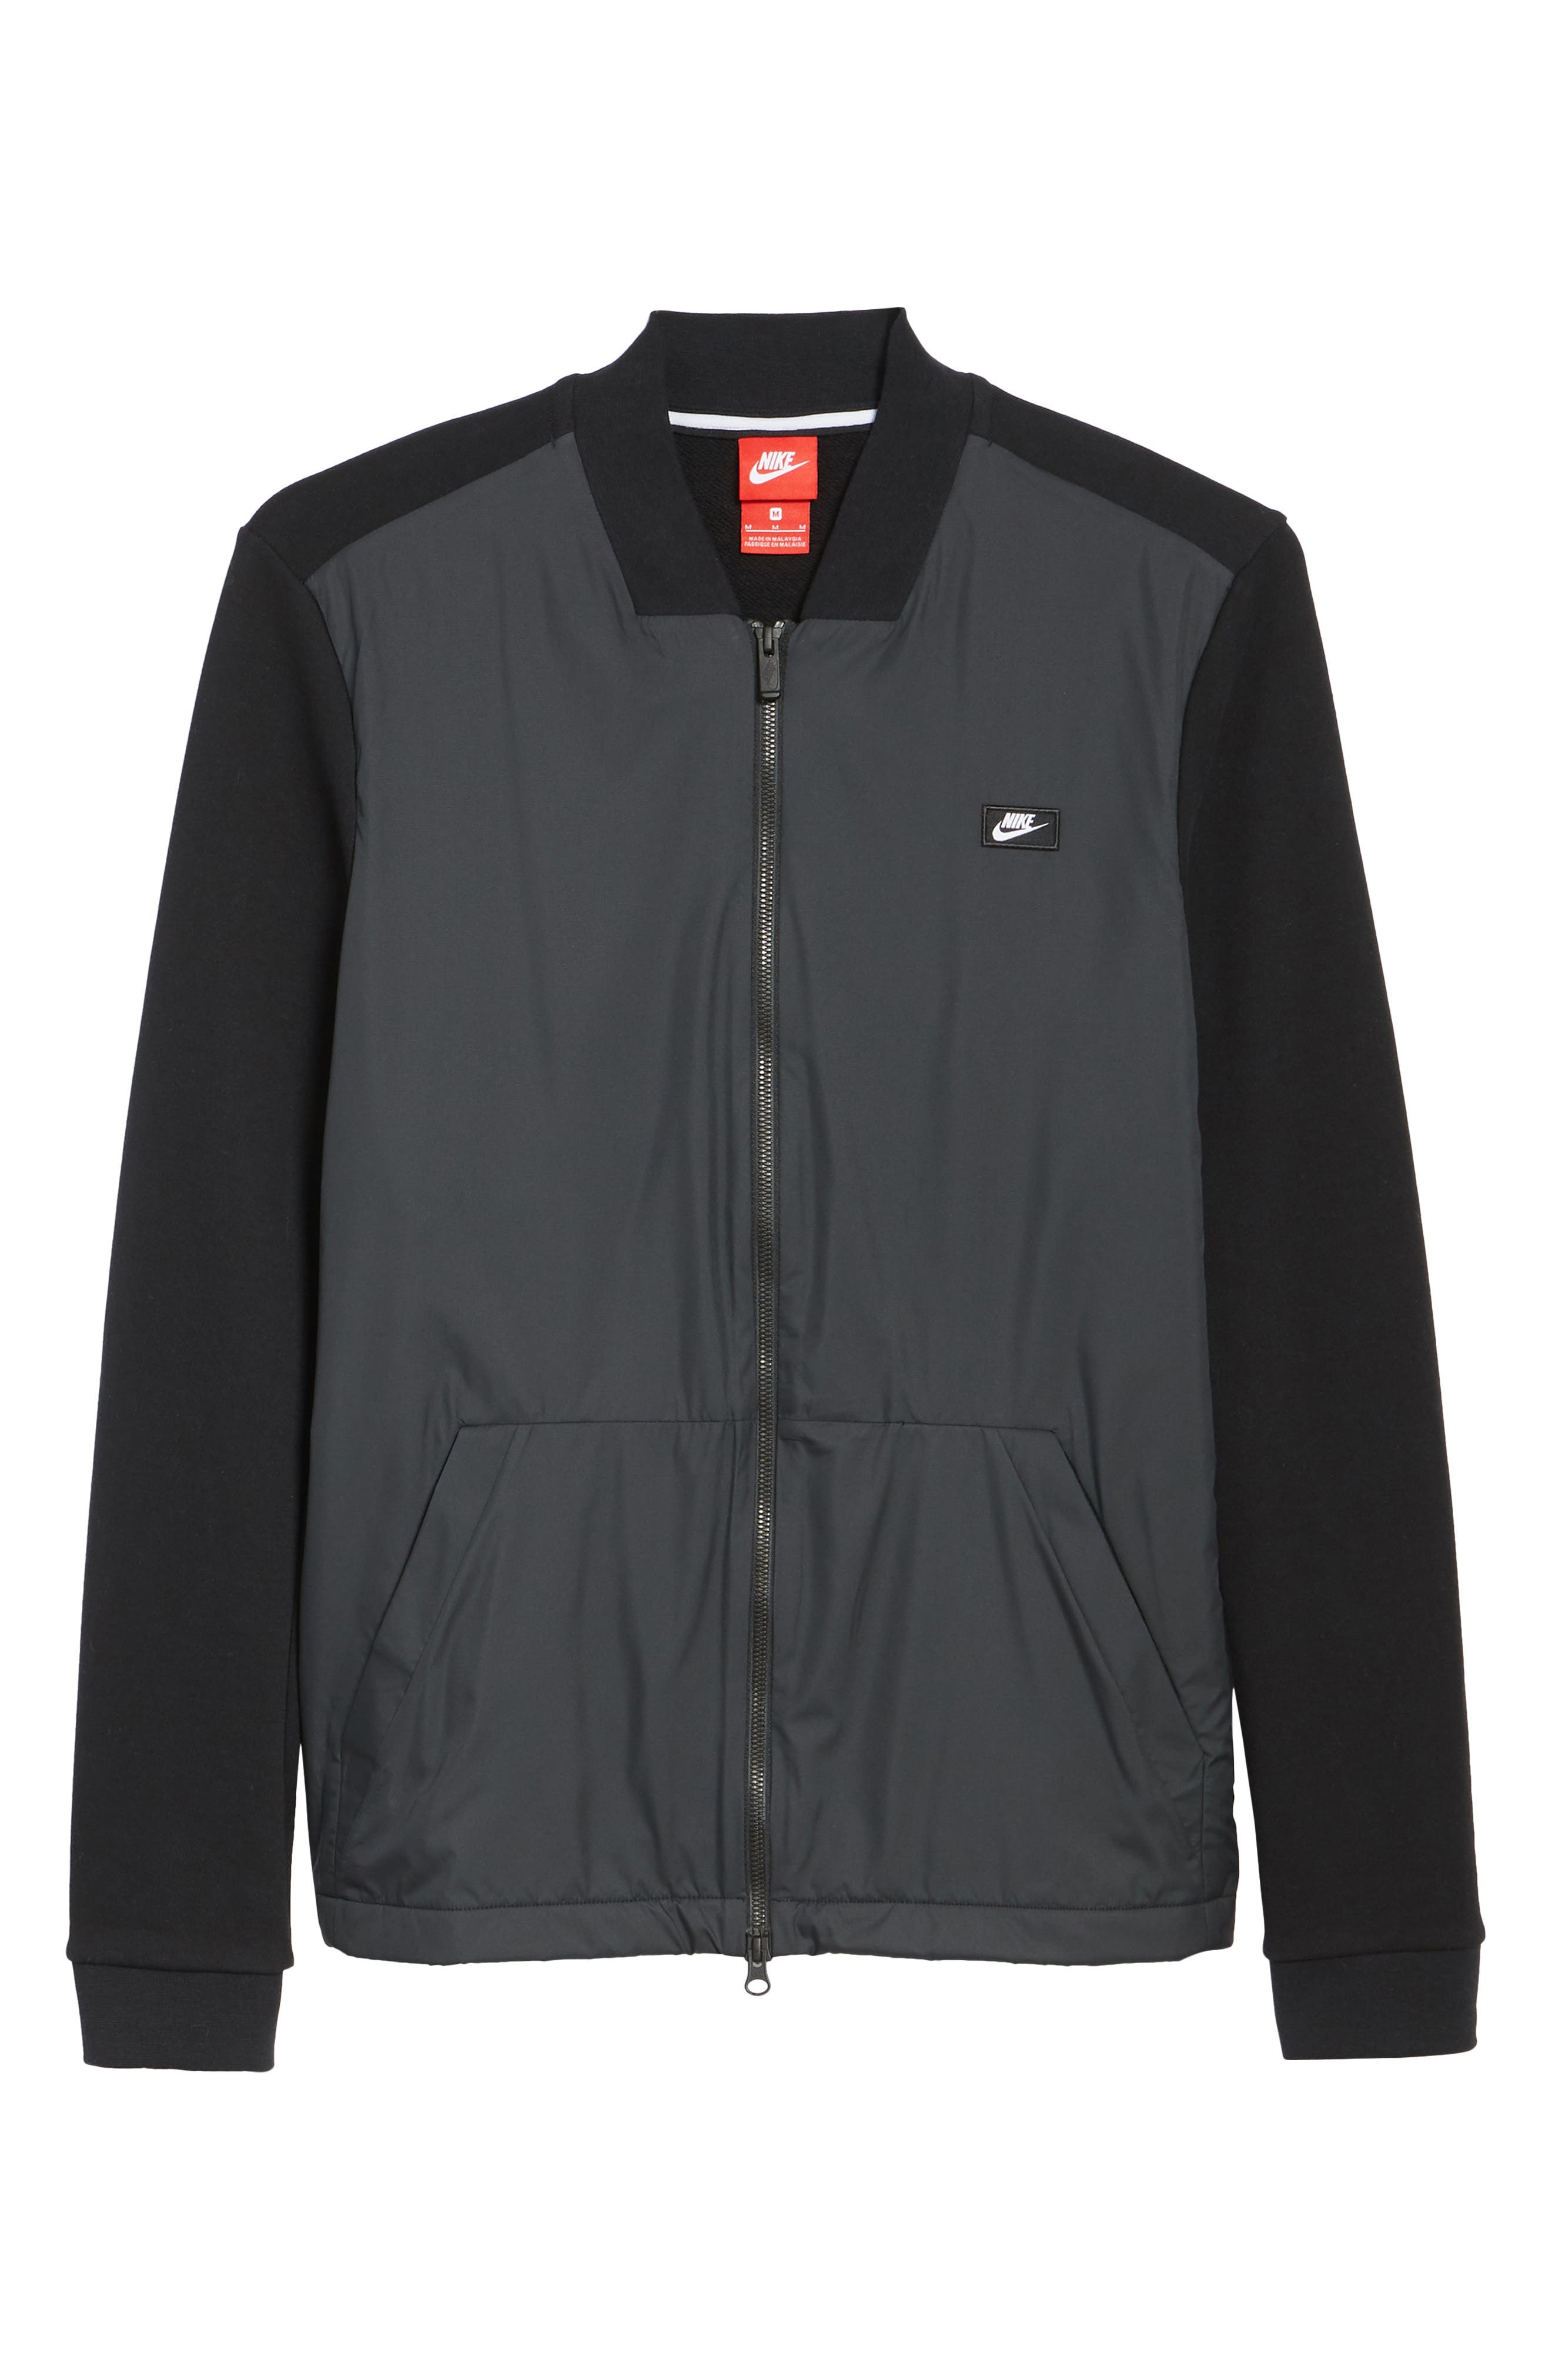 NSW Modern Track Jacket,                             Alternate thumbnail 6, color,                             Black/ Black